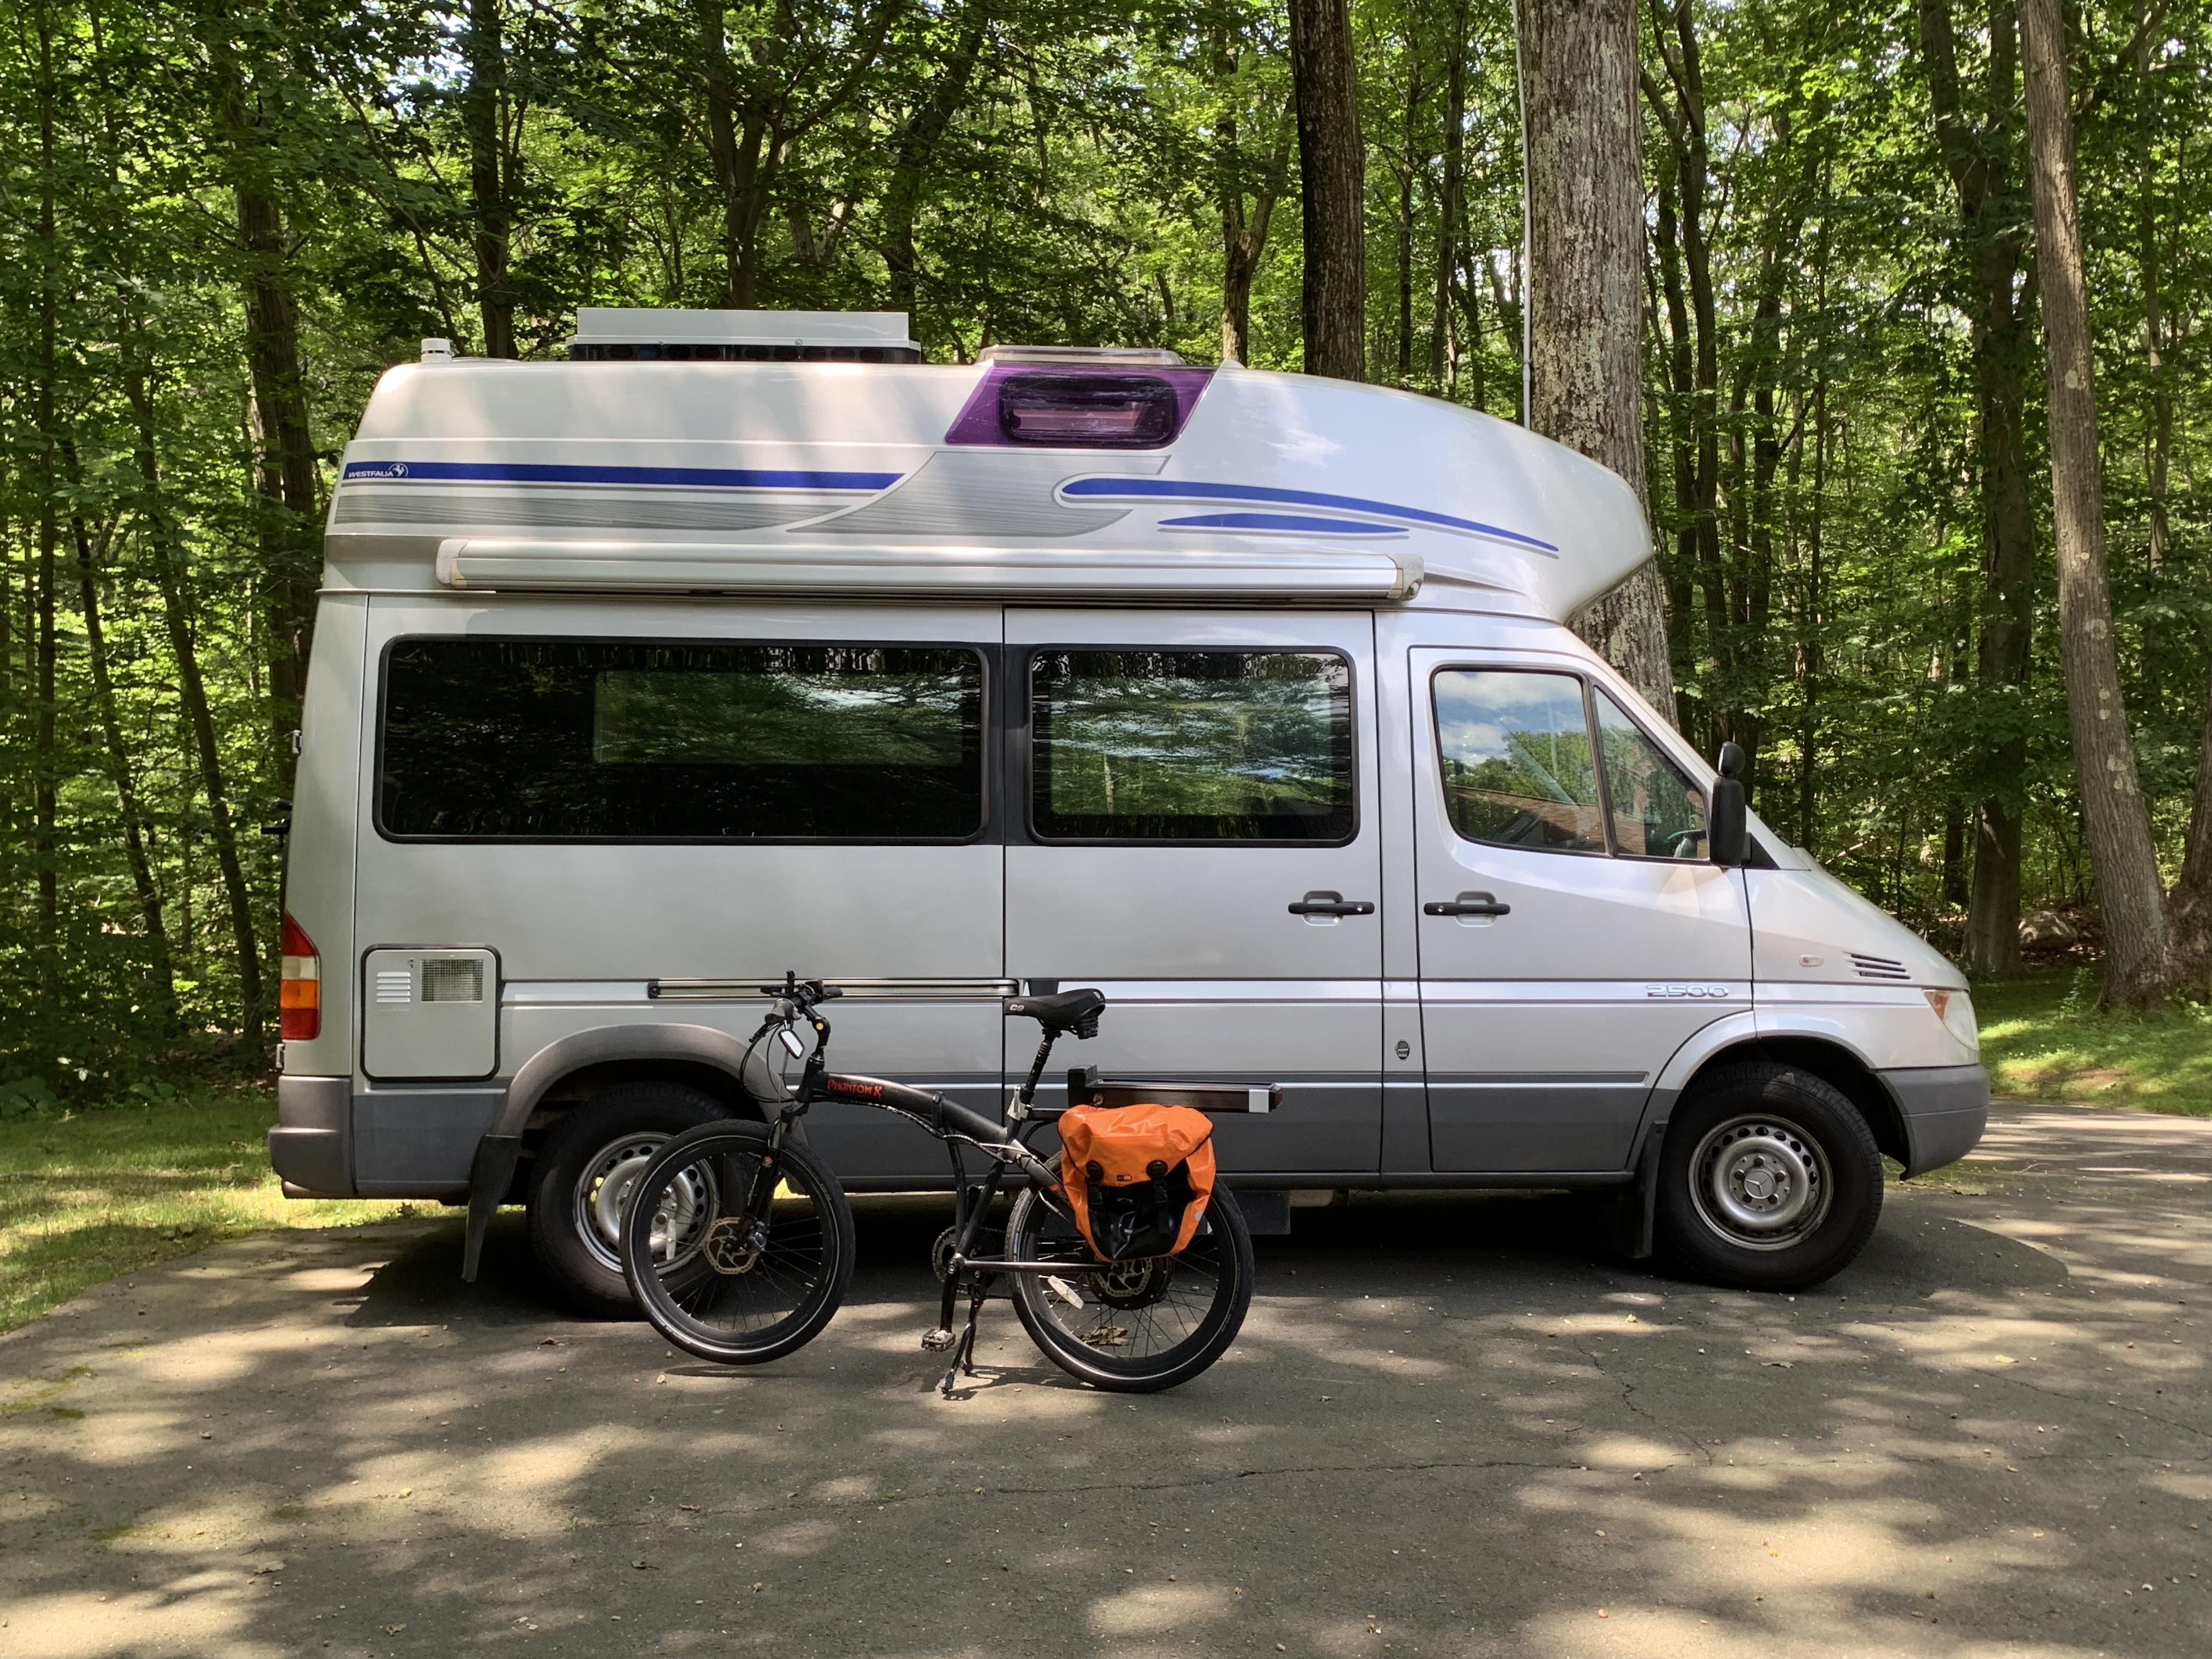 Condo on wheels. Airstream Westfalia 2005